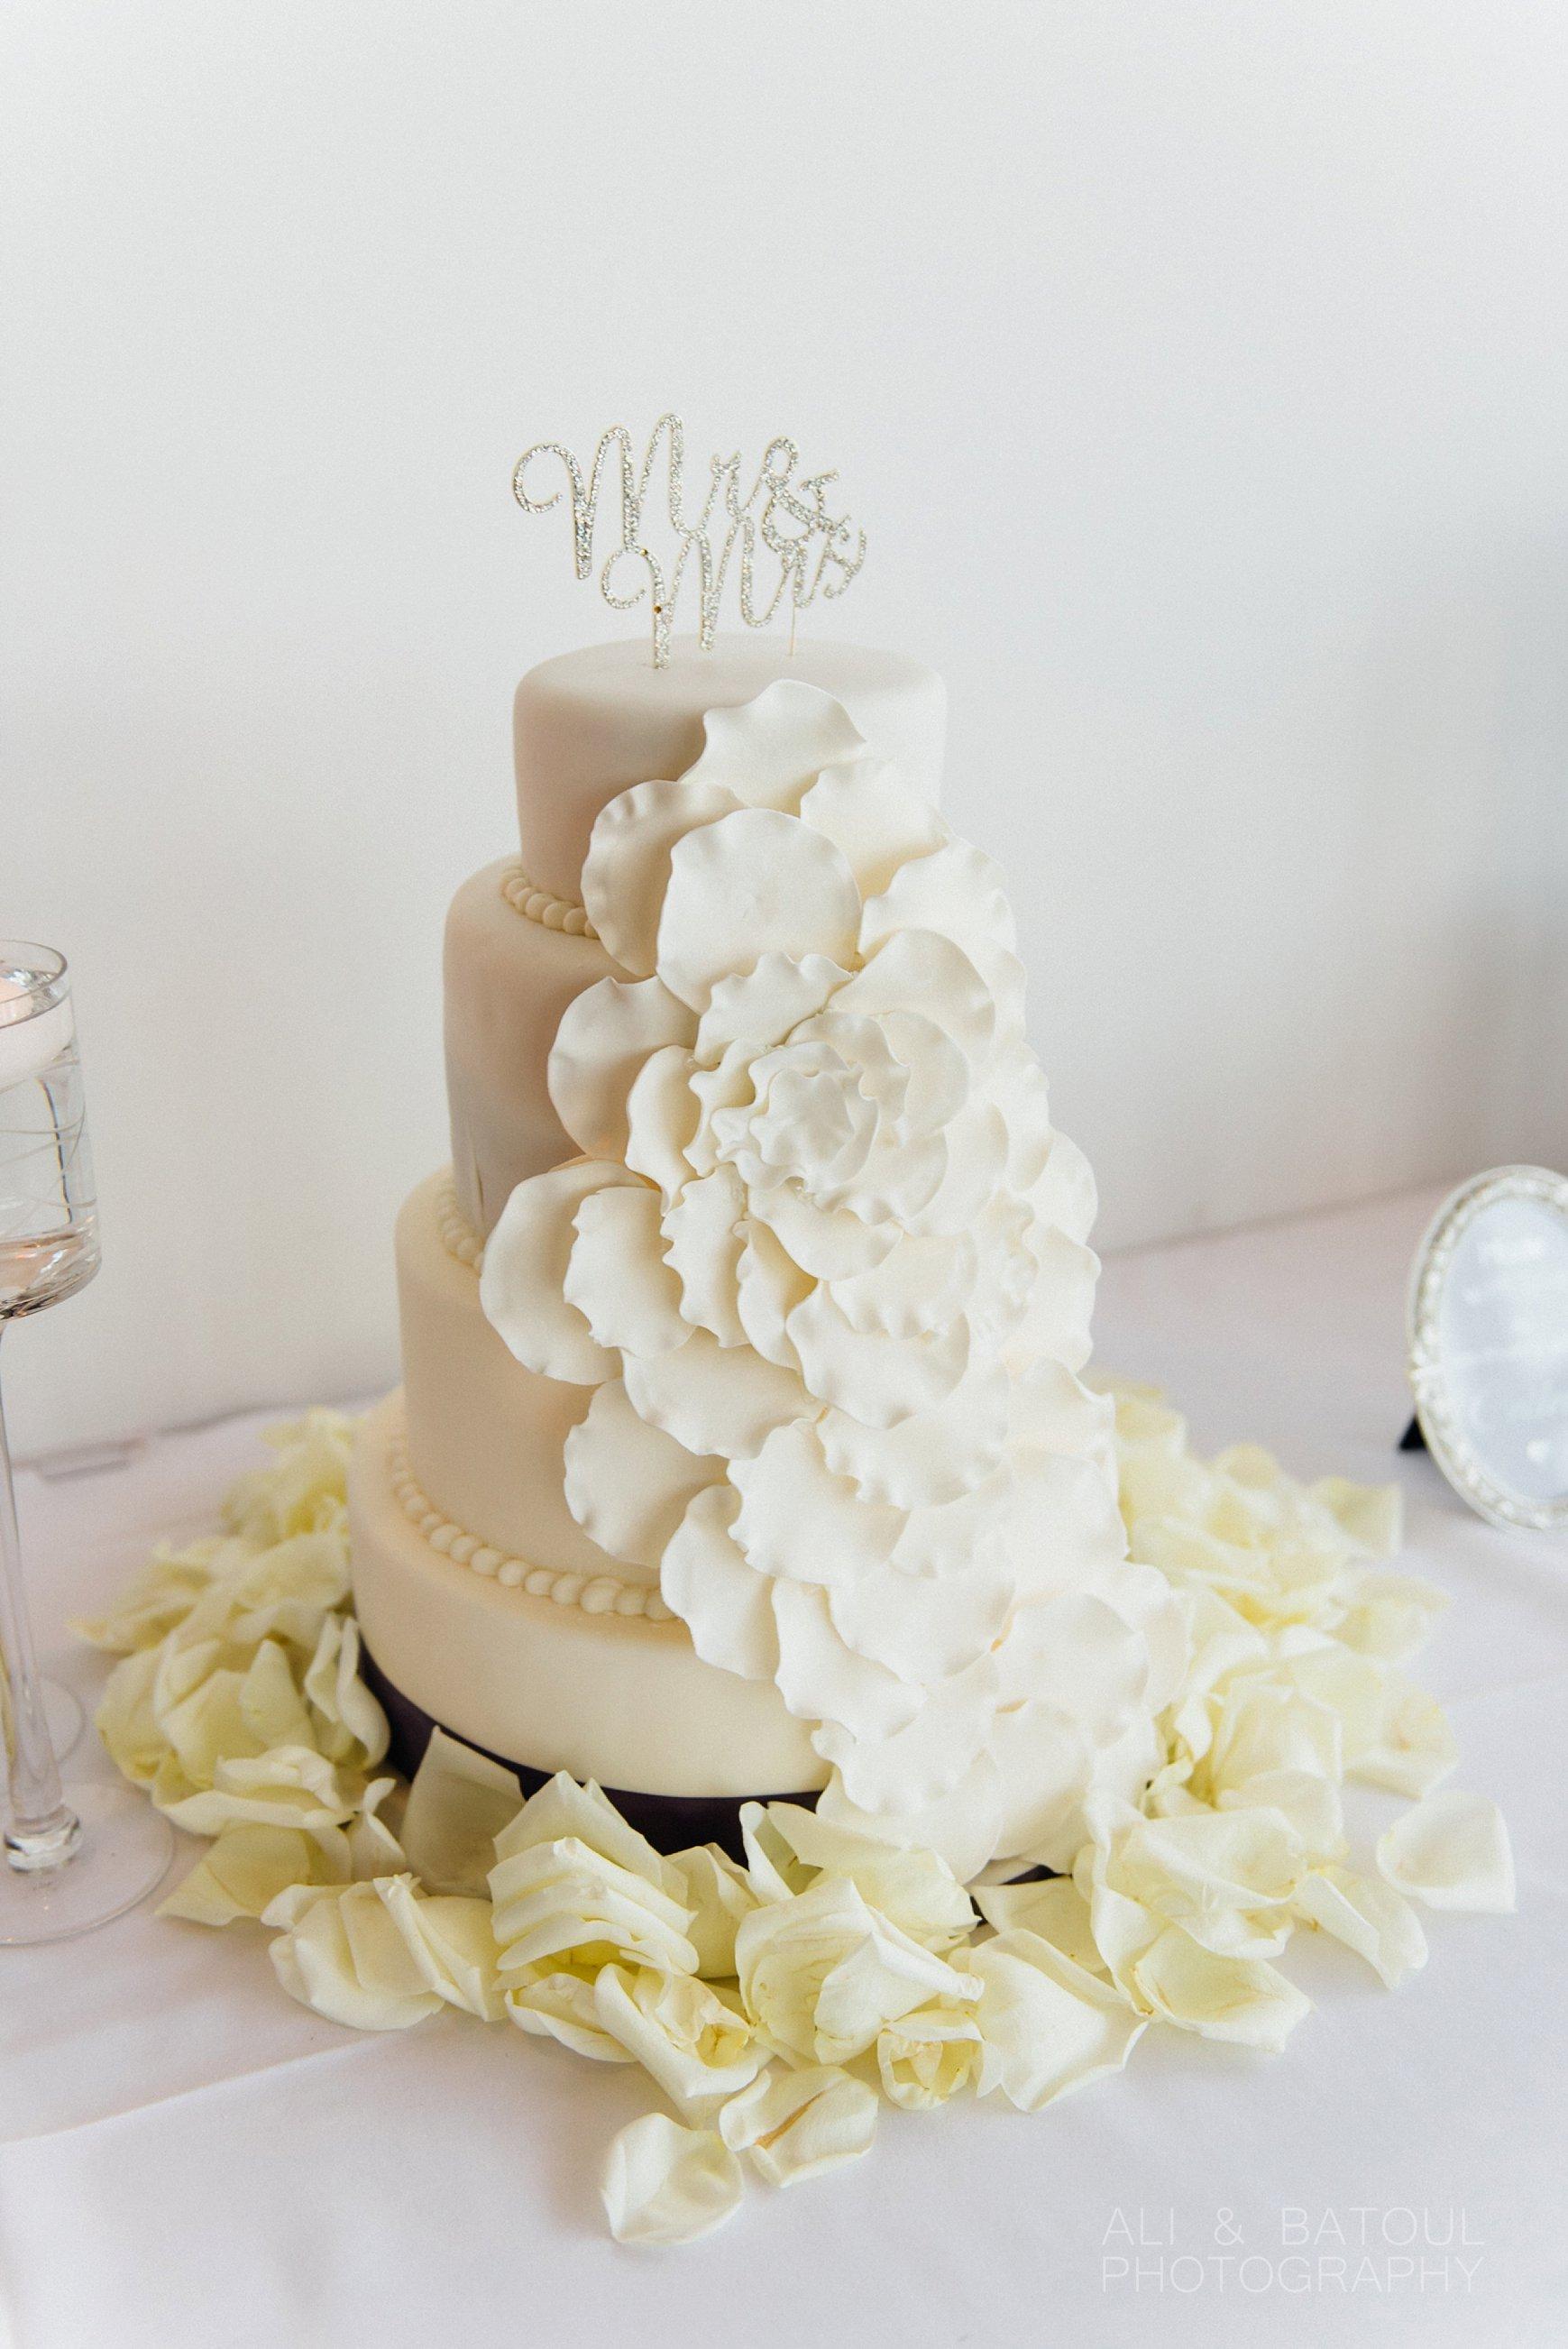 Ali & Batoul Photography - Documentary Fine Art Ottawa Wedding Photography_0017.jpg